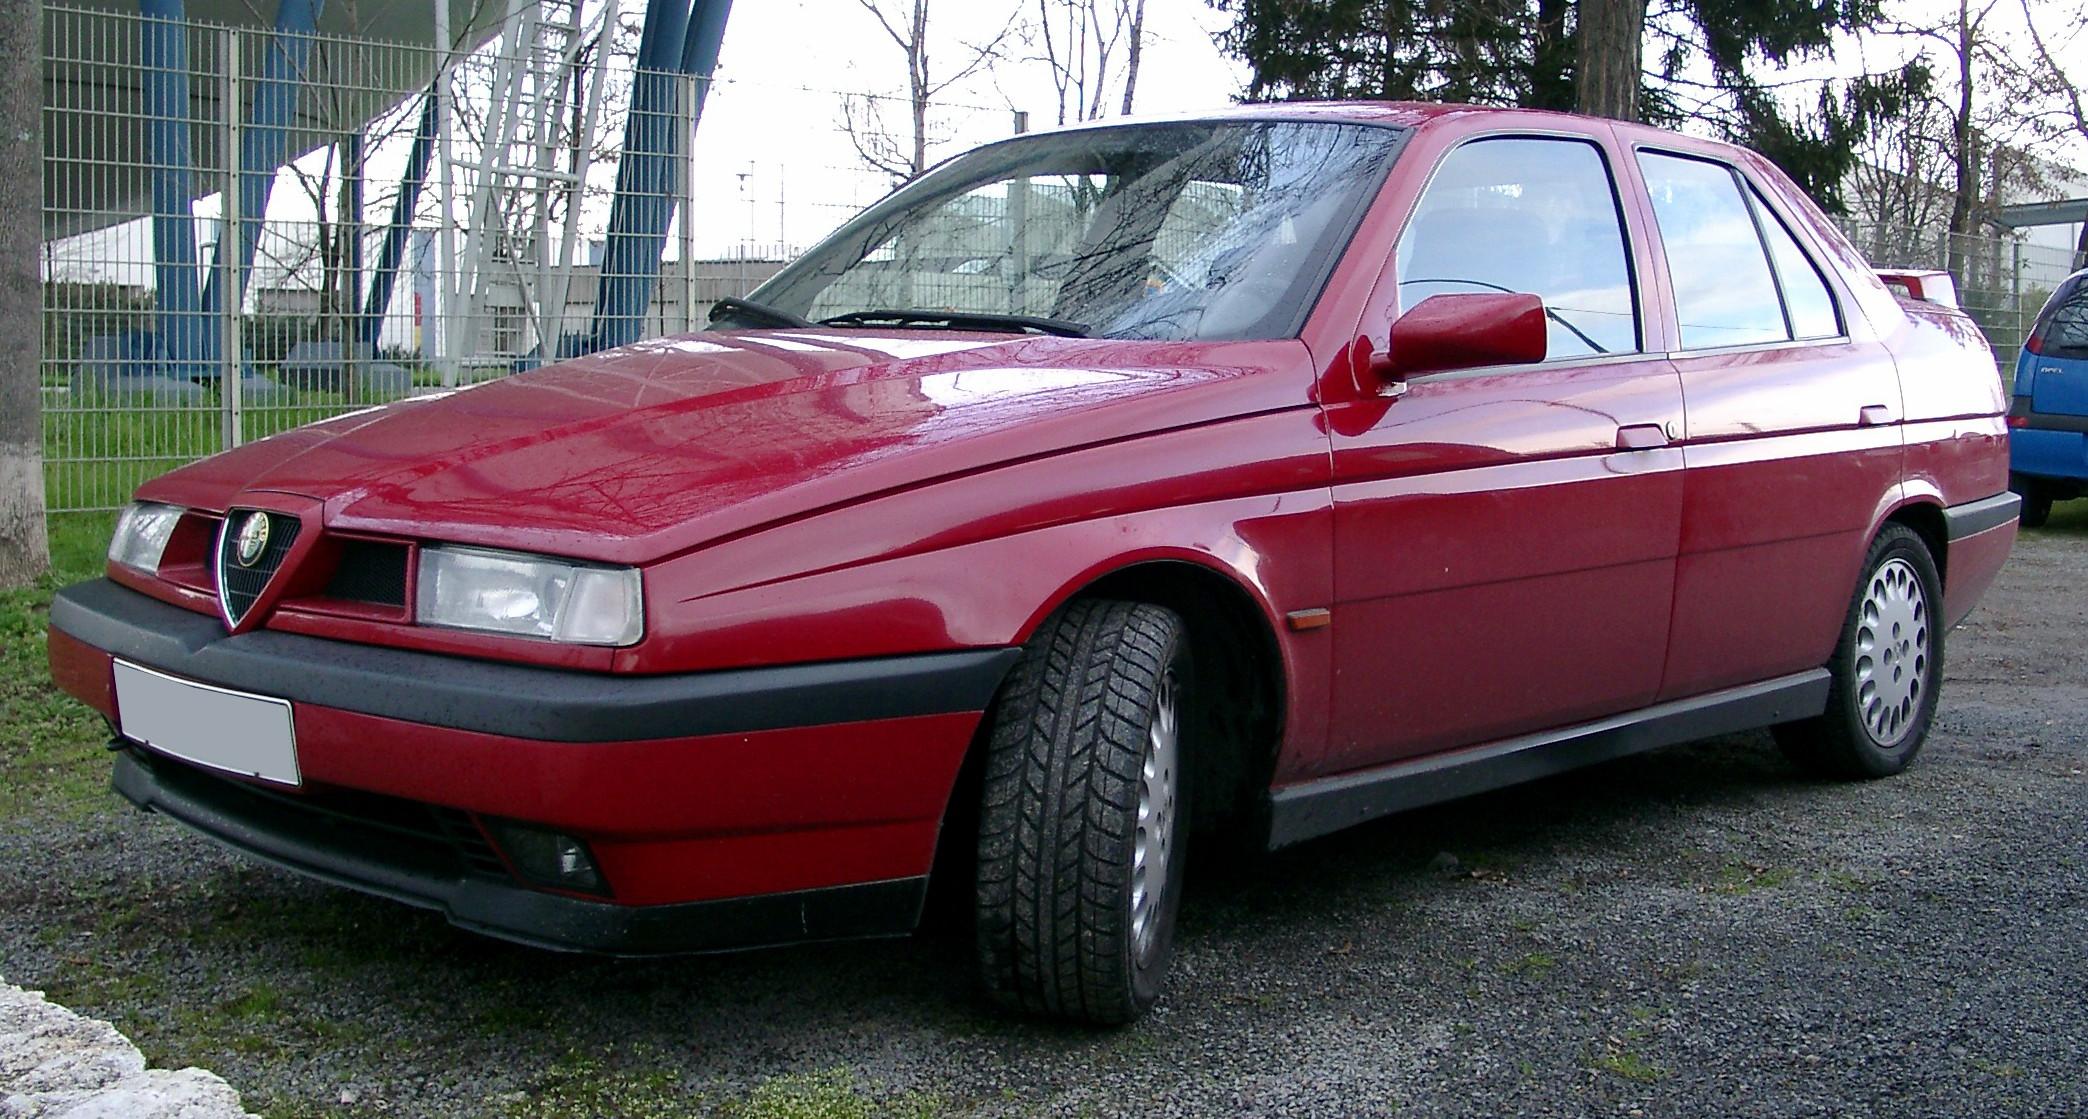 Файл:Alfa Romeo 155 front 20070321.jpg